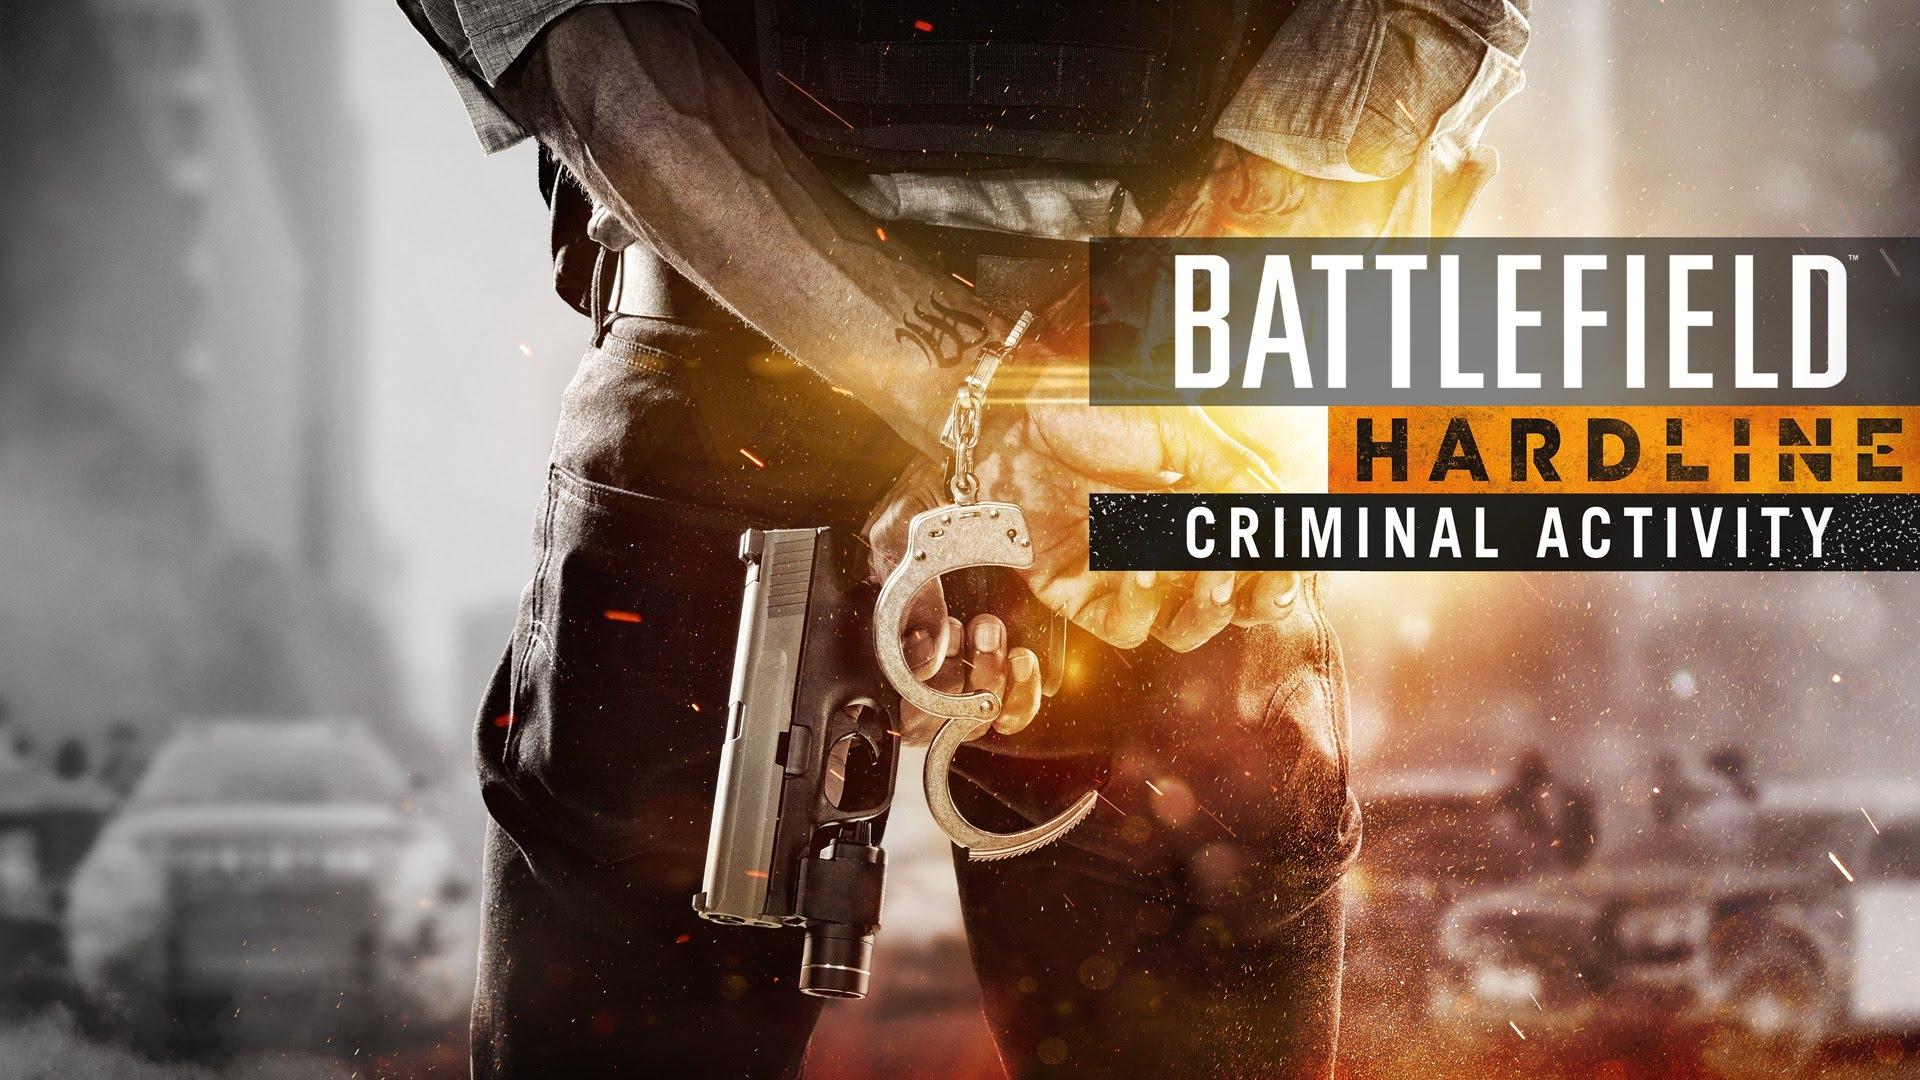 HD Wallpapers Battlefield Hardline Criminal Activity